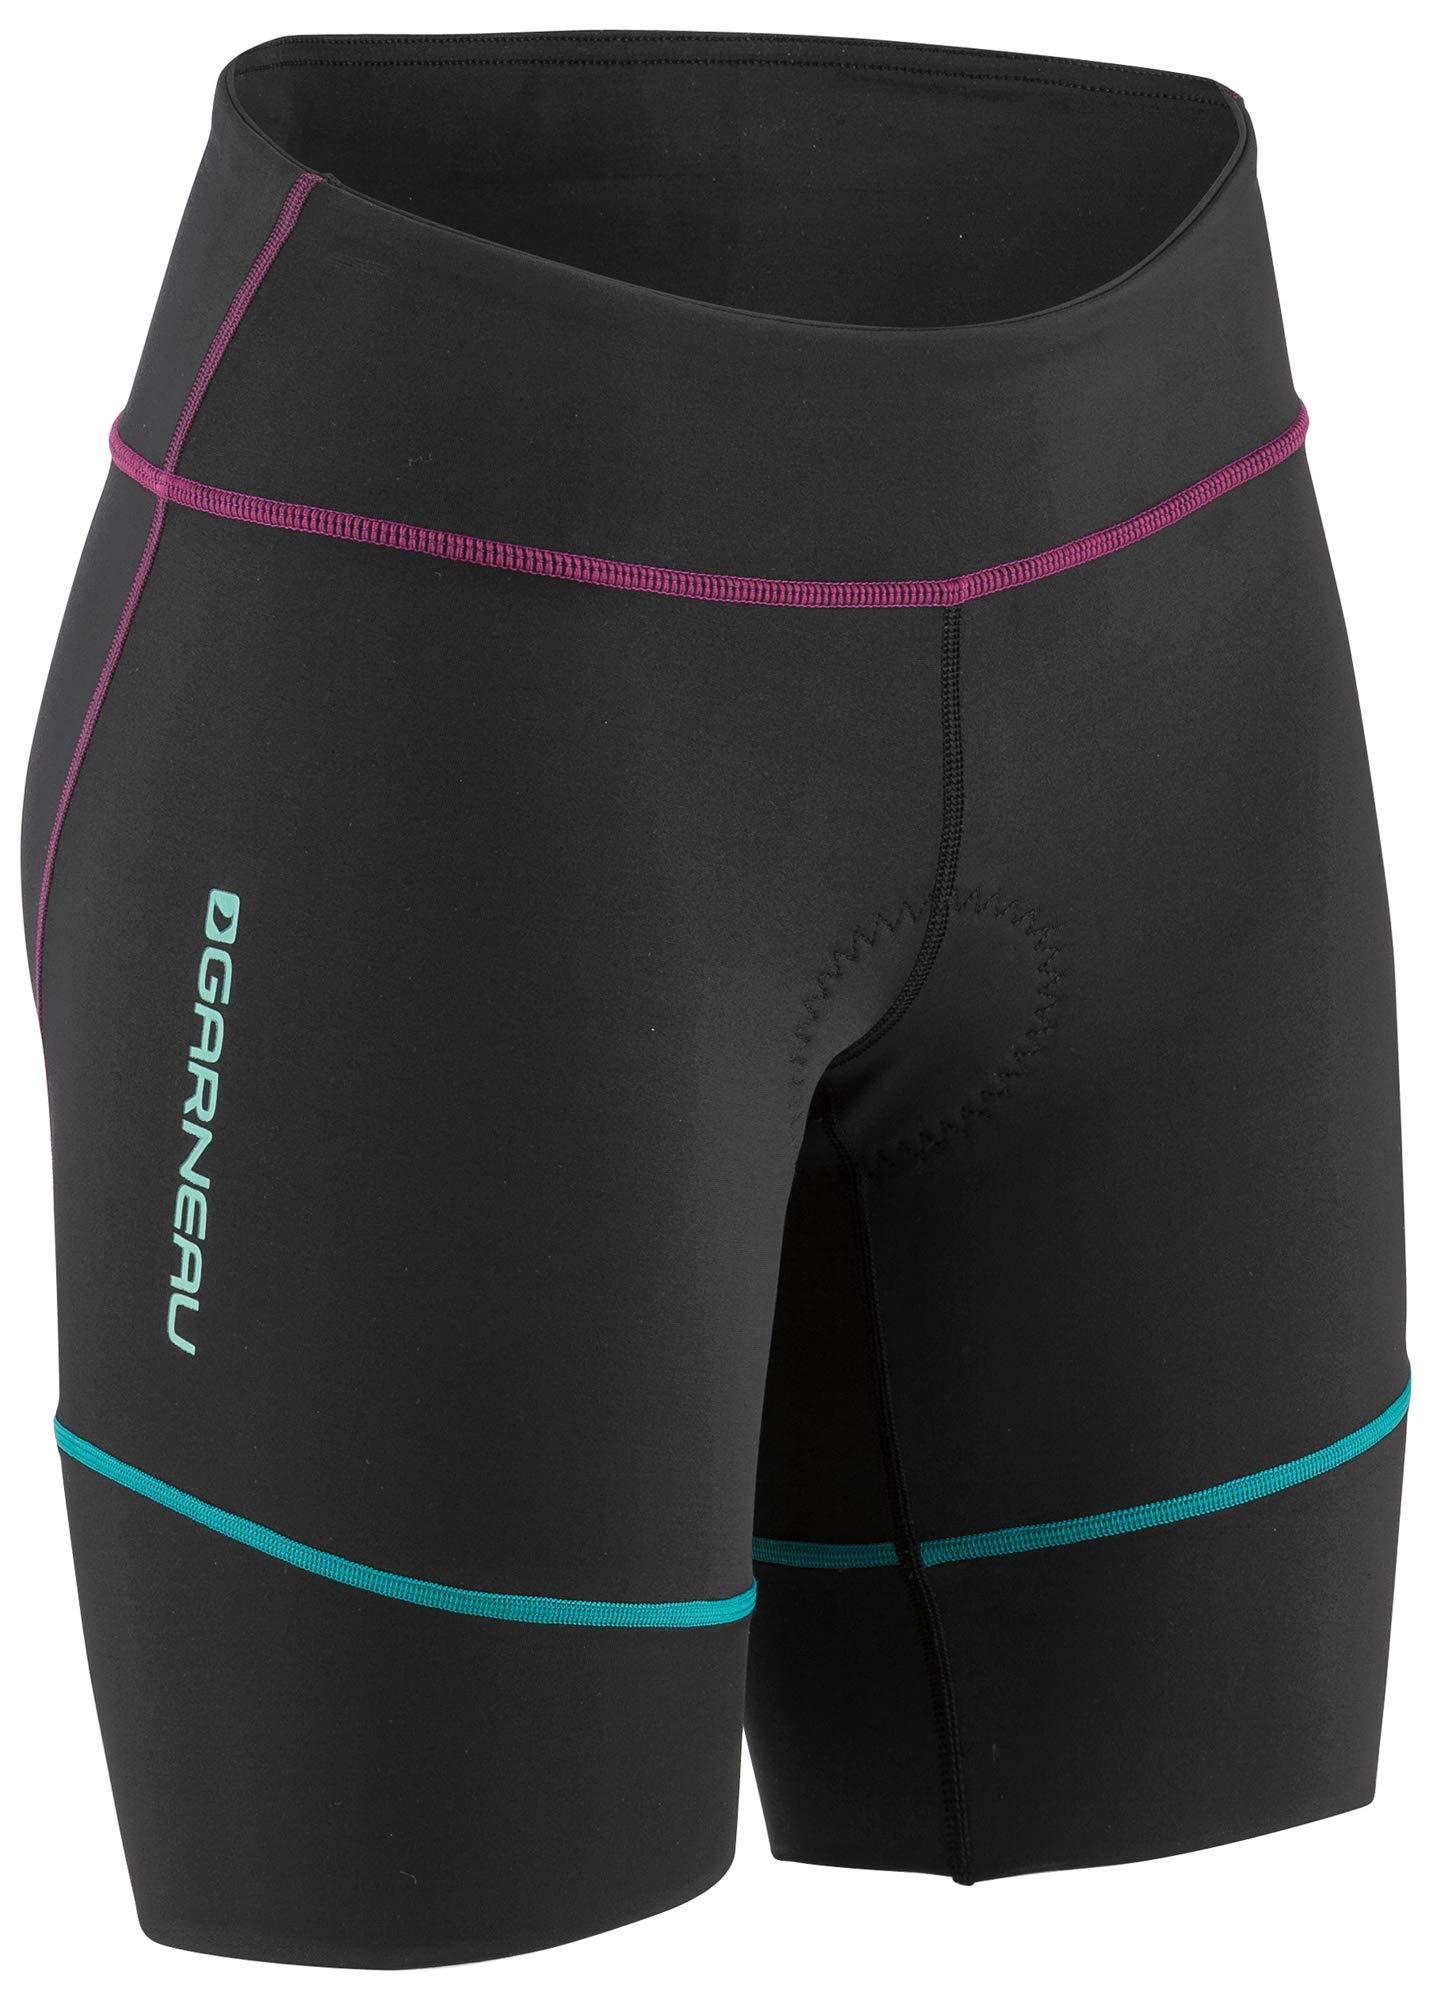 Louis Garneau Women's Tri Comp Triathlon Shorts, Black/Purple/Green, X-Large